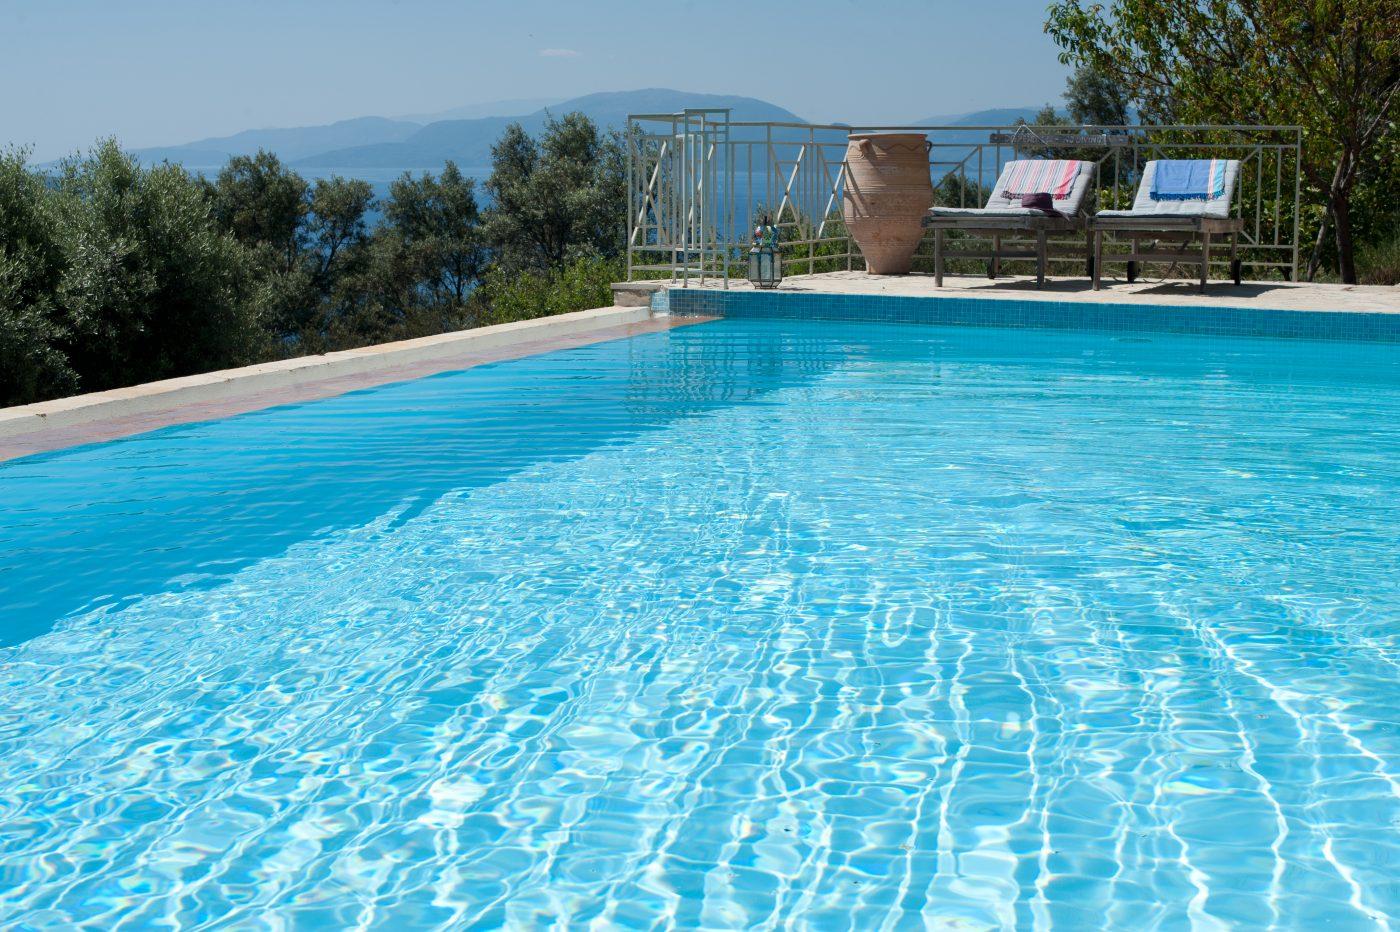 Kalokairi A Luxury Villa In Lefkada Greece To Sleep 10